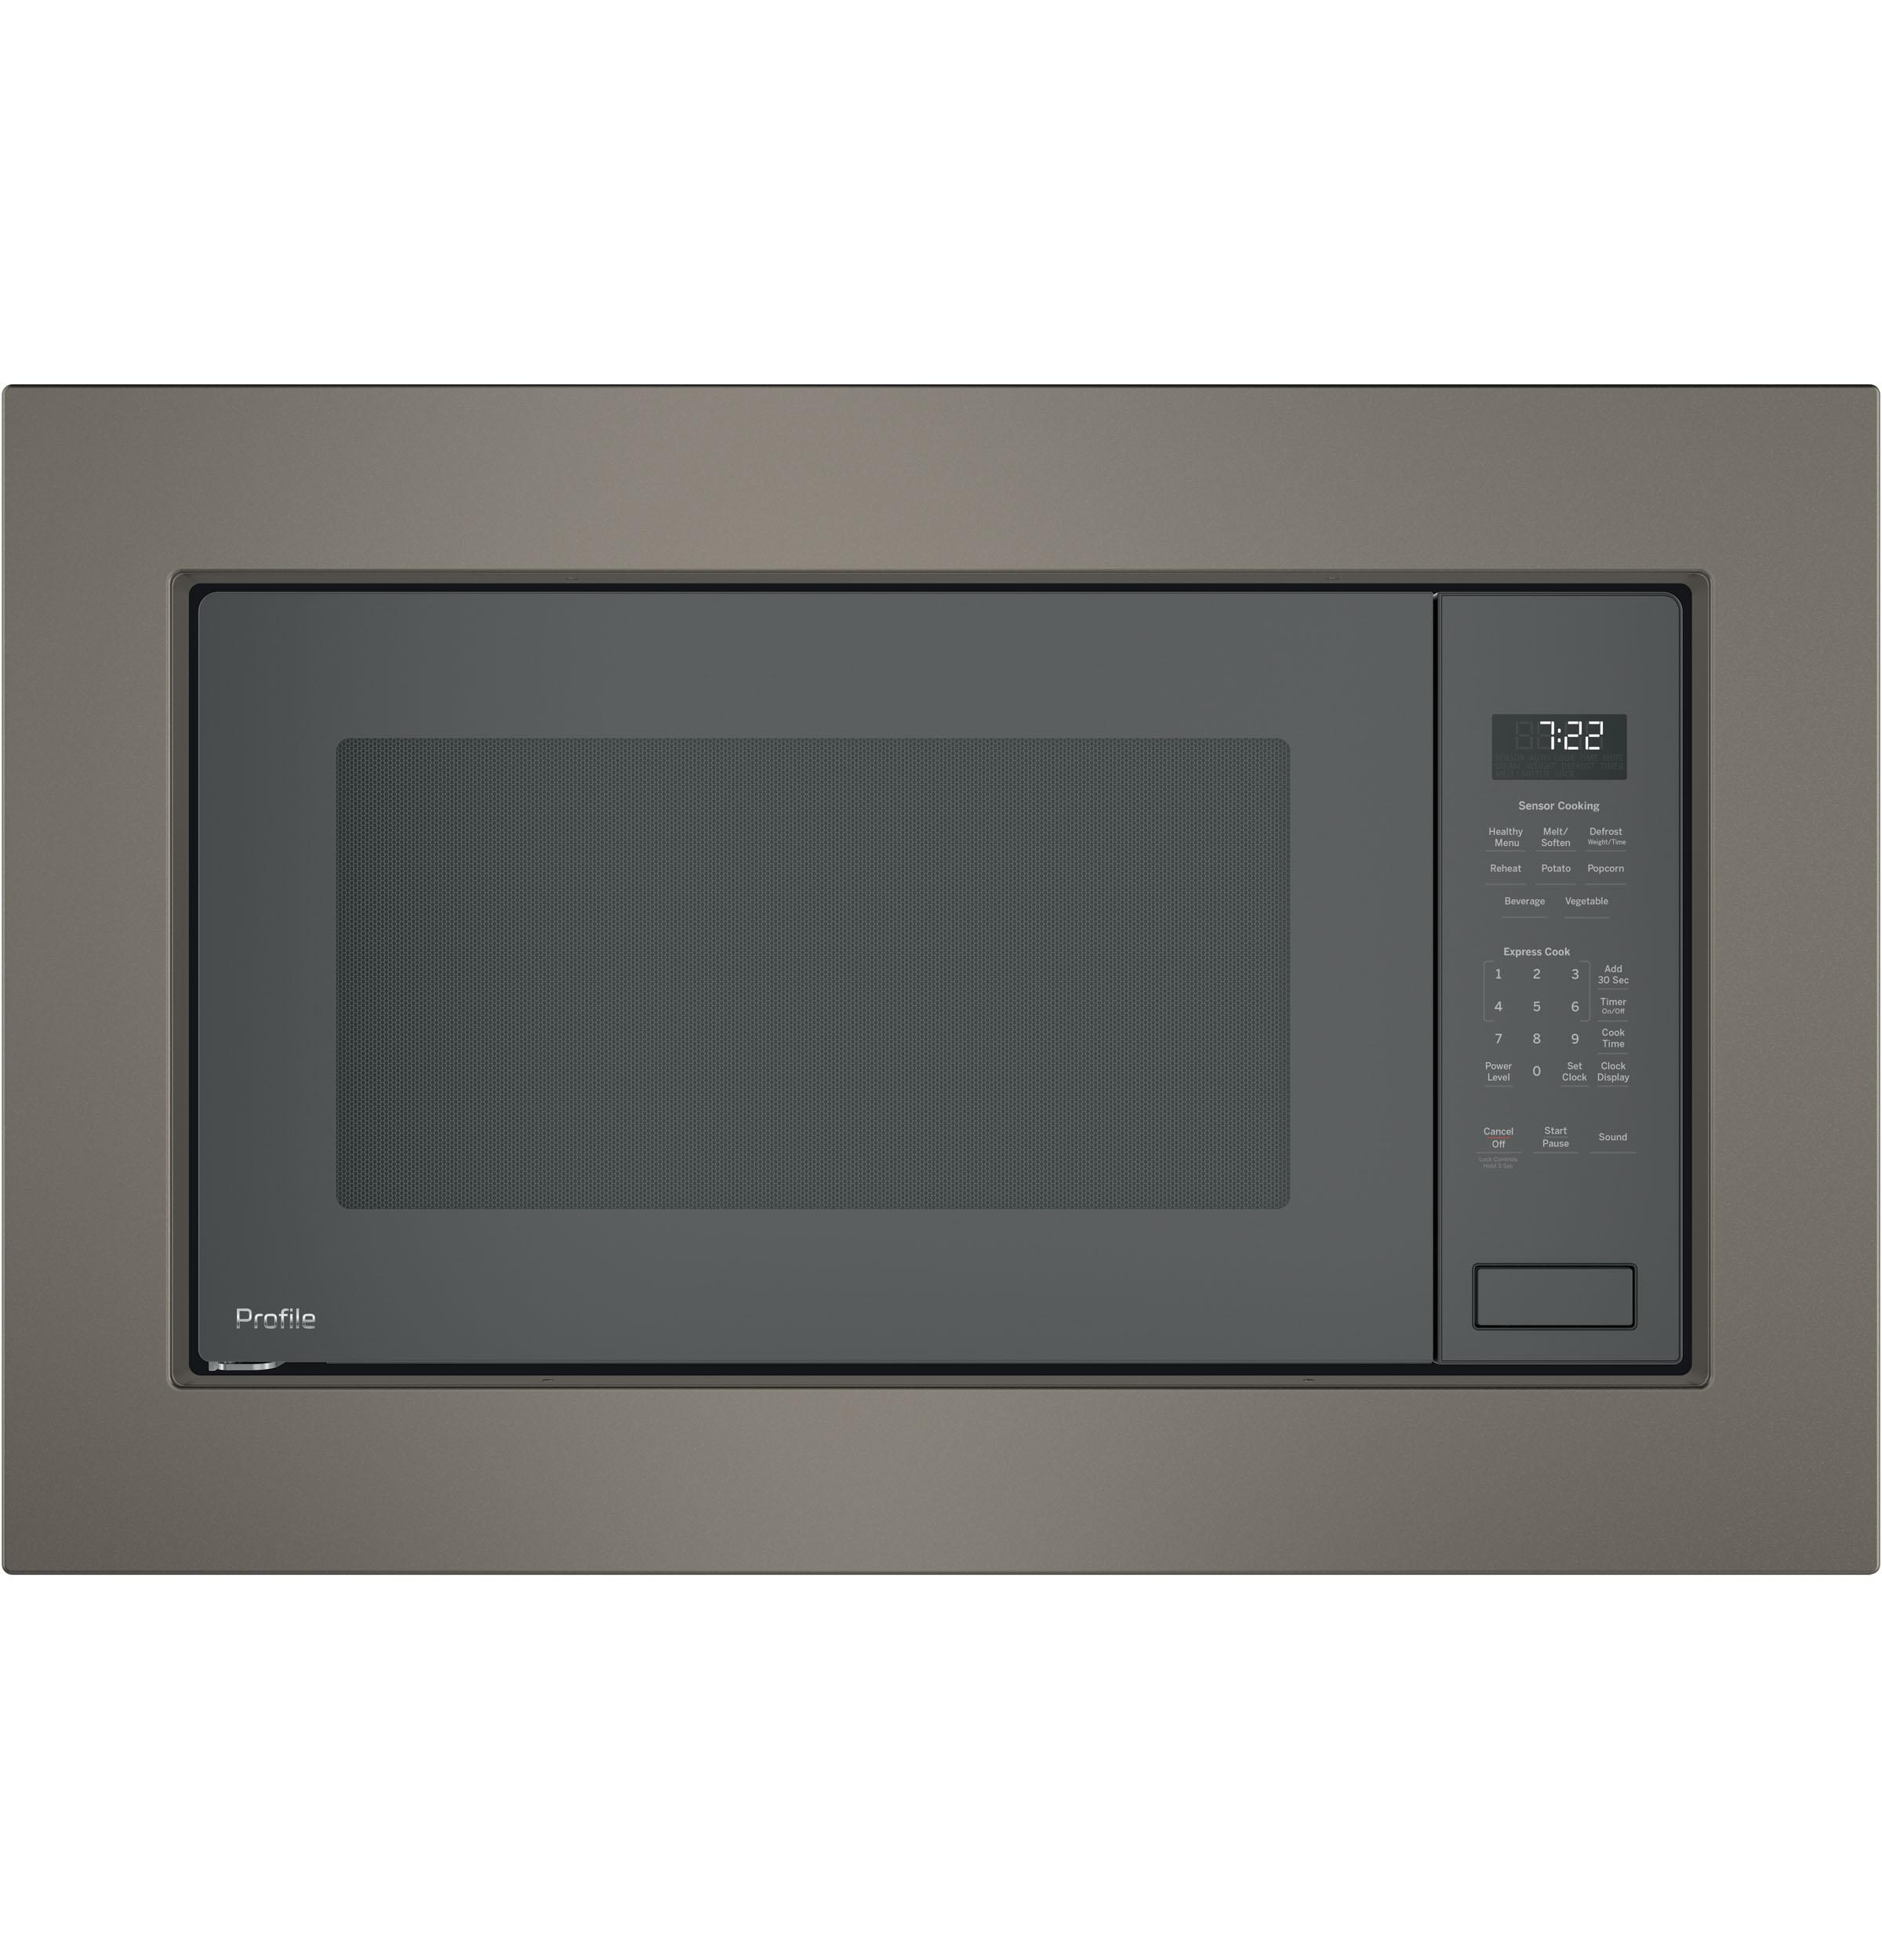 Model: PEB7227SLSS | GE Profile™ Series 2.2 Cu. Ft. Built-In Sensor Microwave Oven